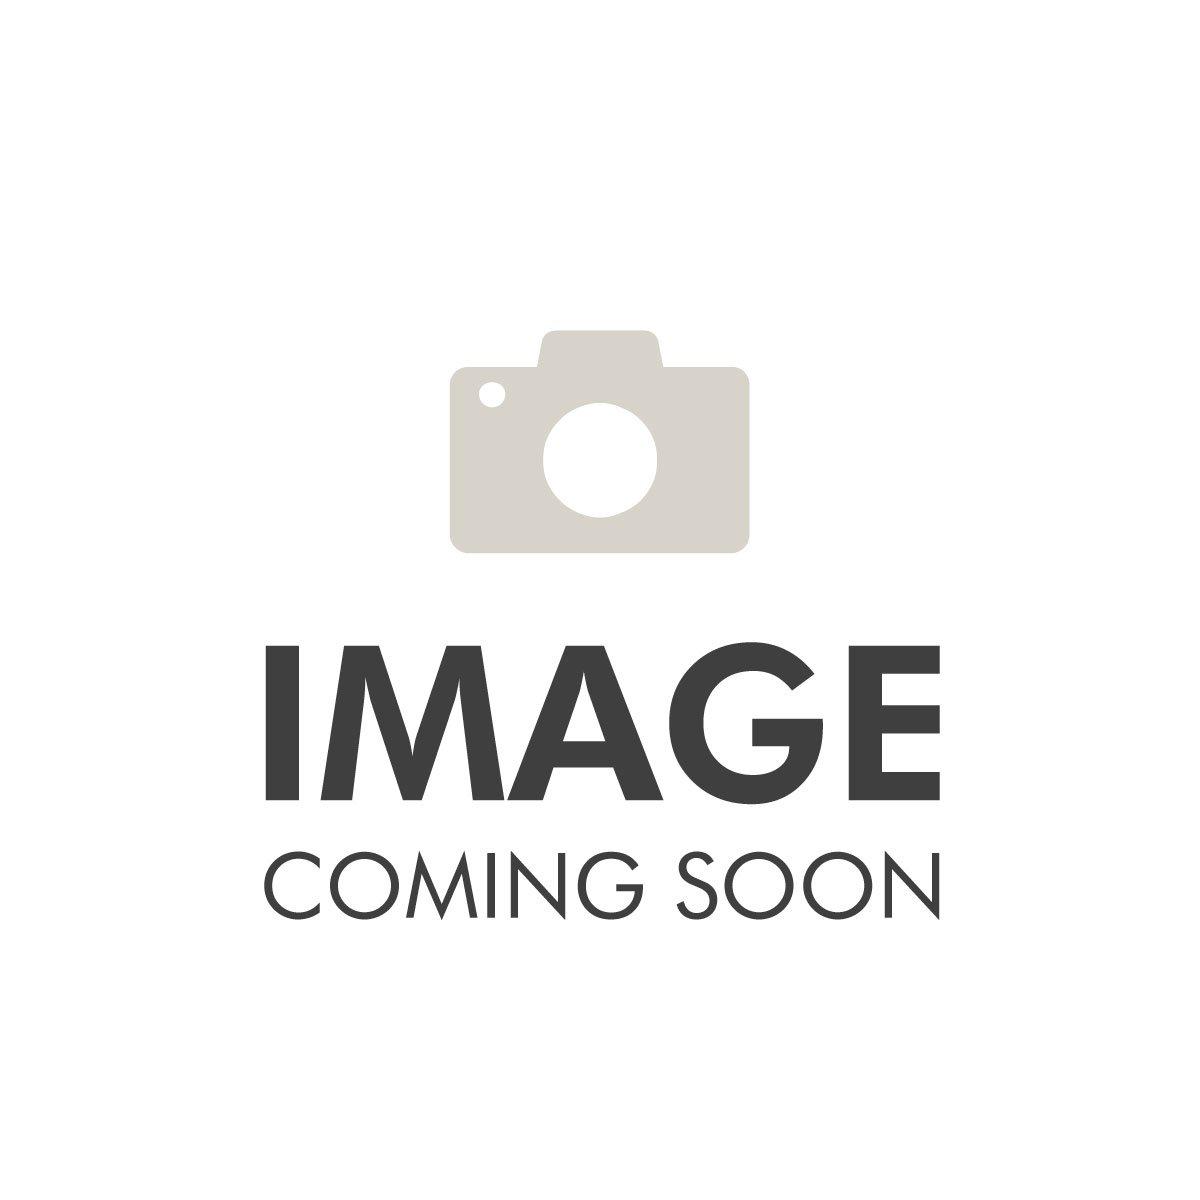 L'Oreal Derma Genesis Pore Minimising Smoother 50ml